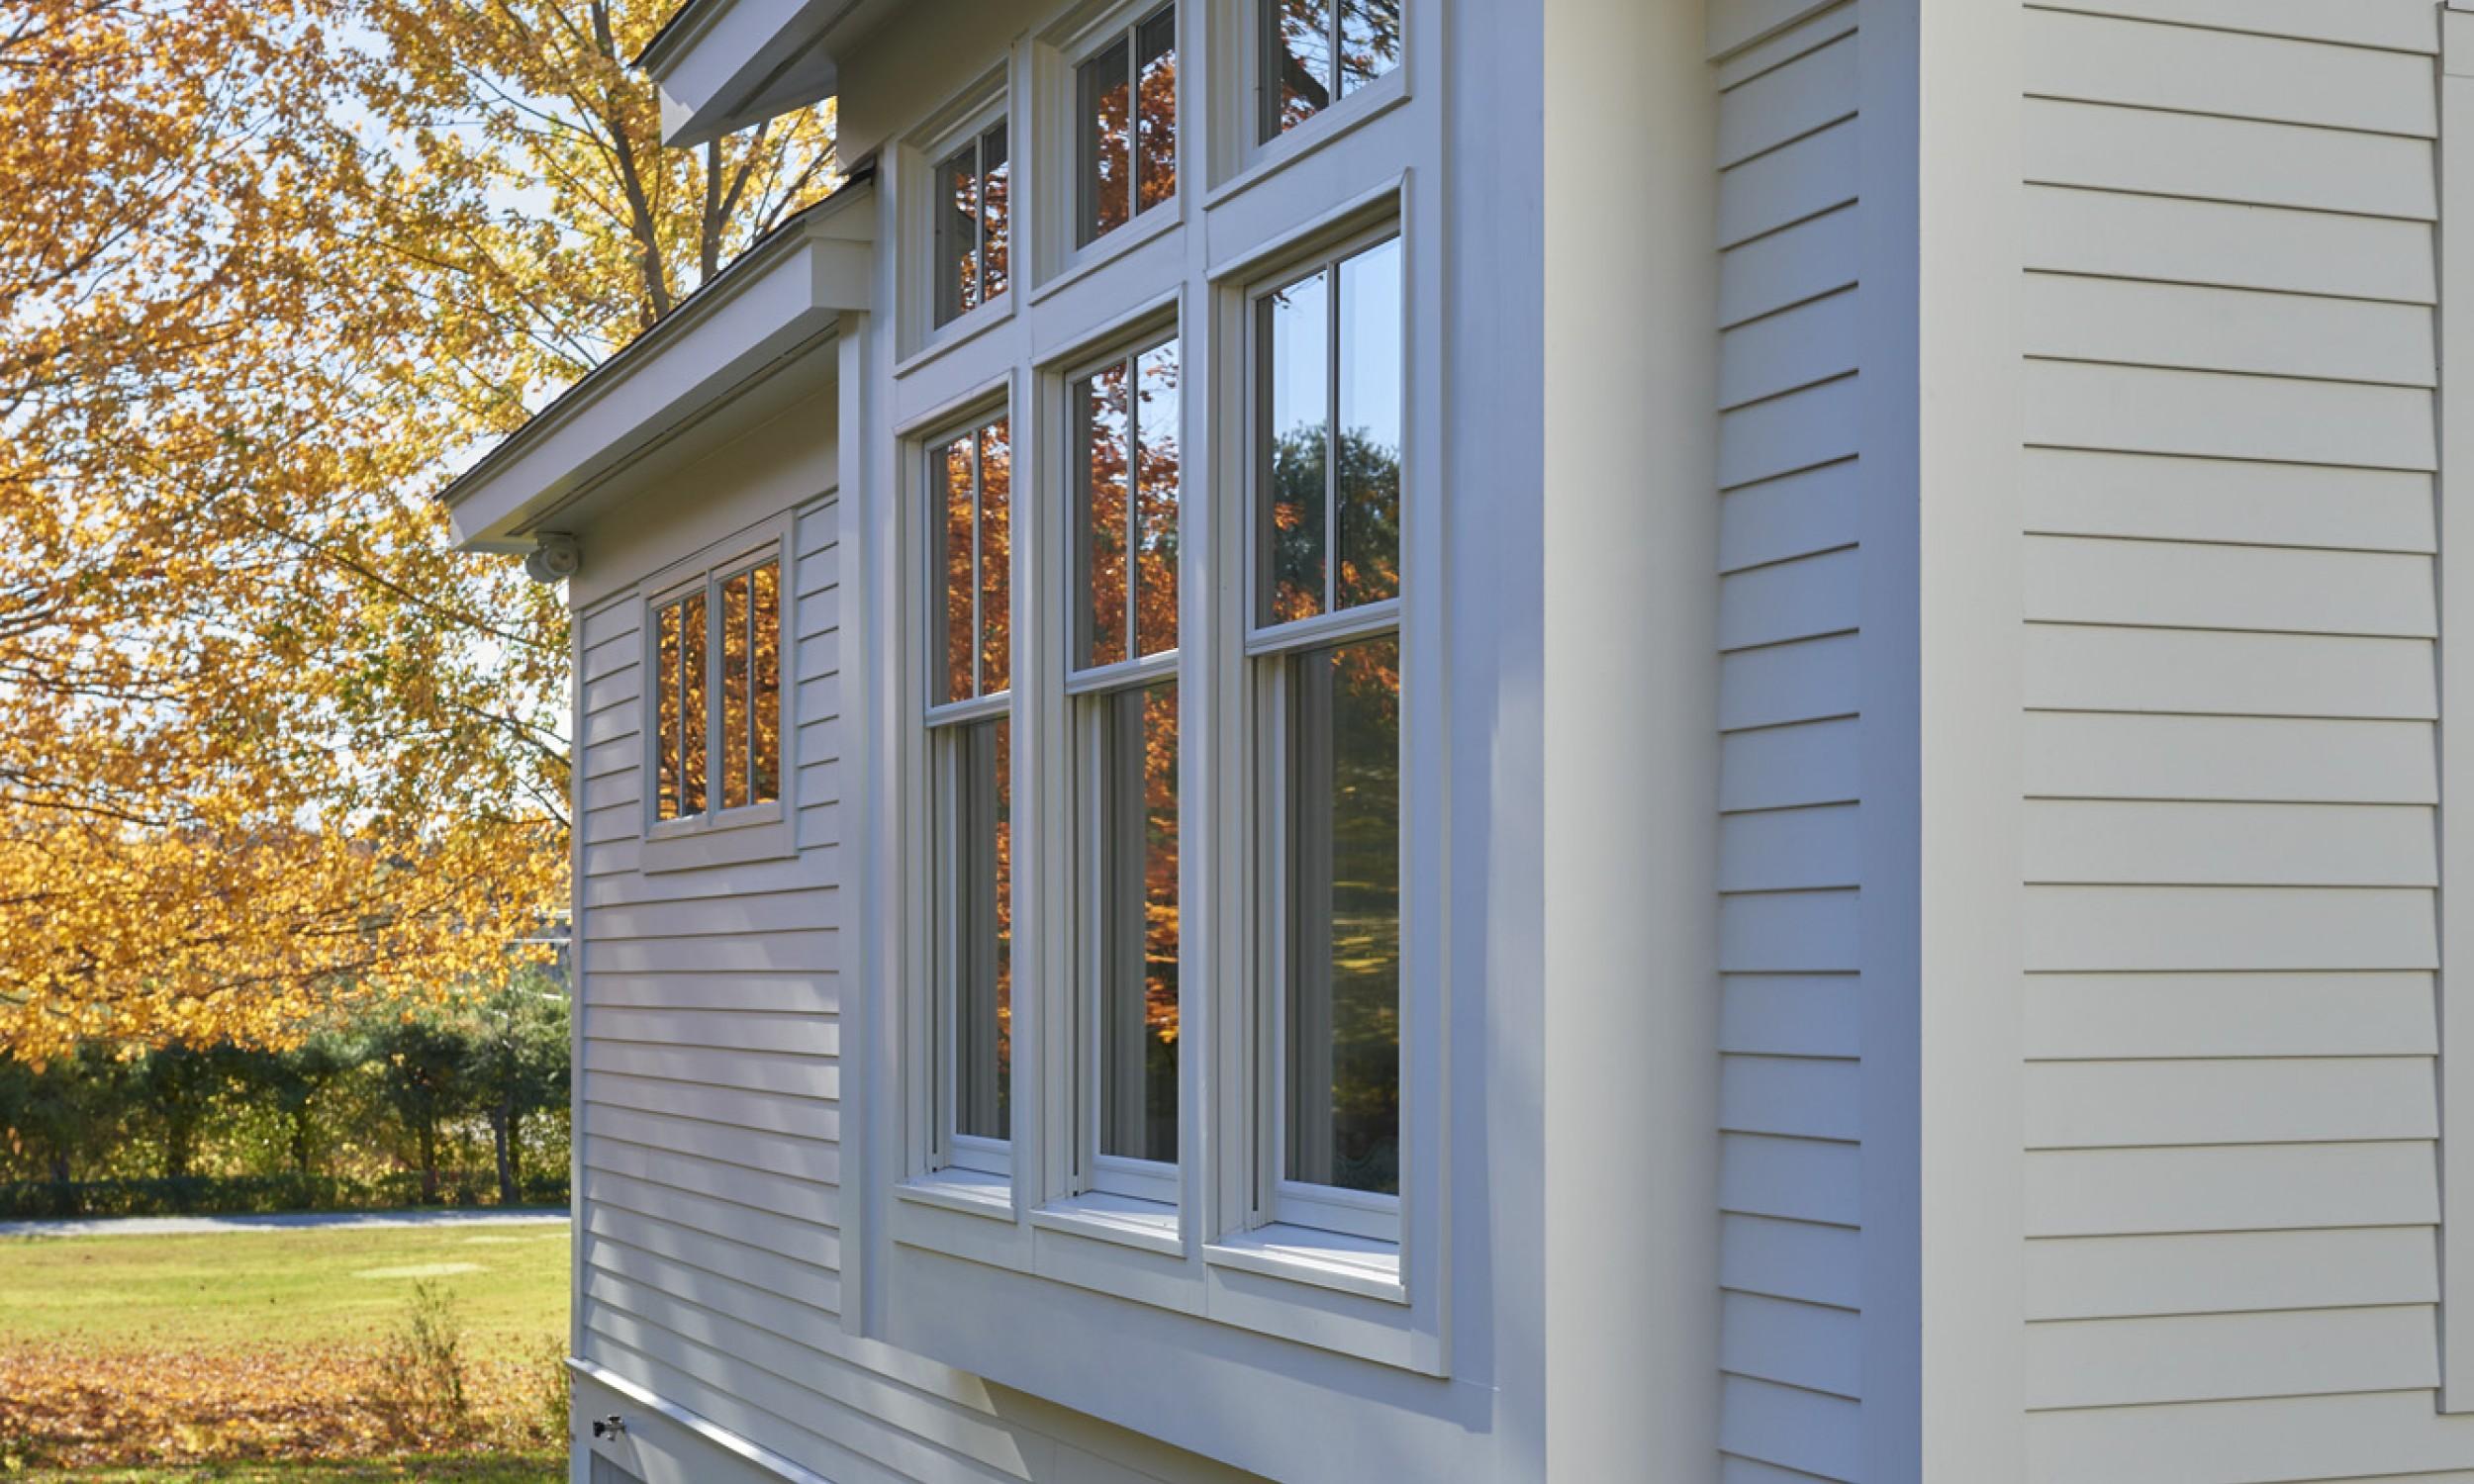 Bay window, white siding, clapboards, cement board siding, Maine Architect